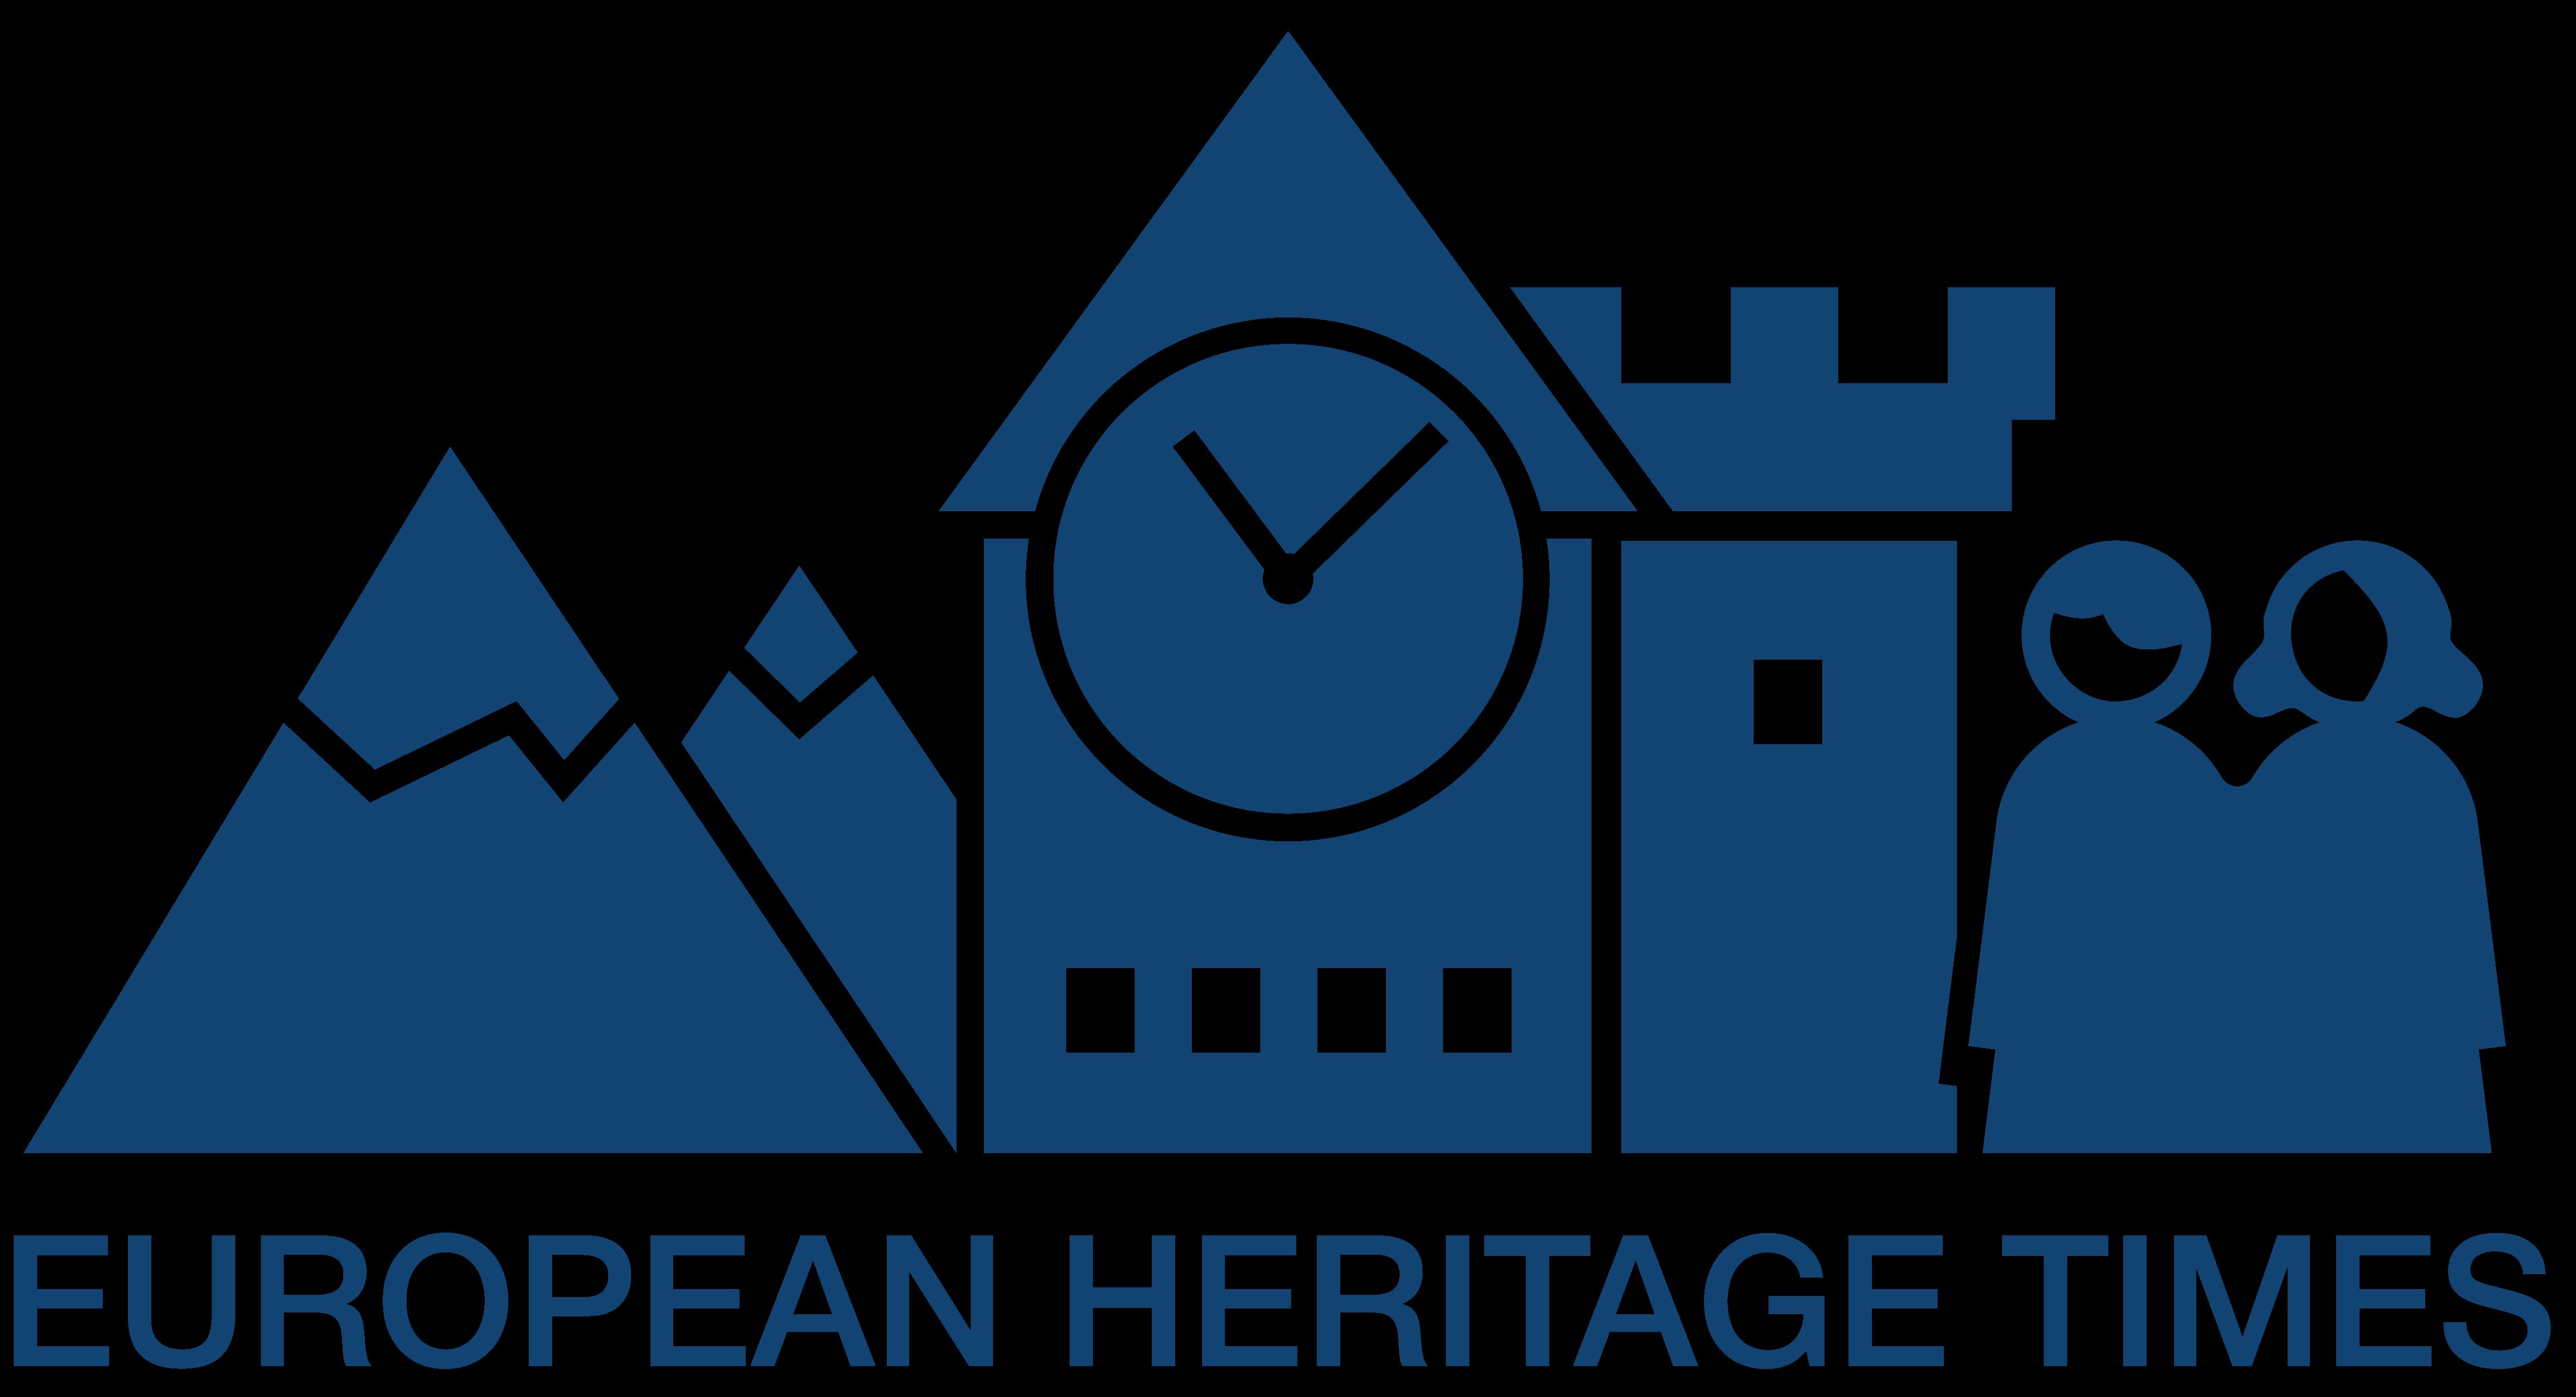 EUROPEAN HERITAGE TIMES